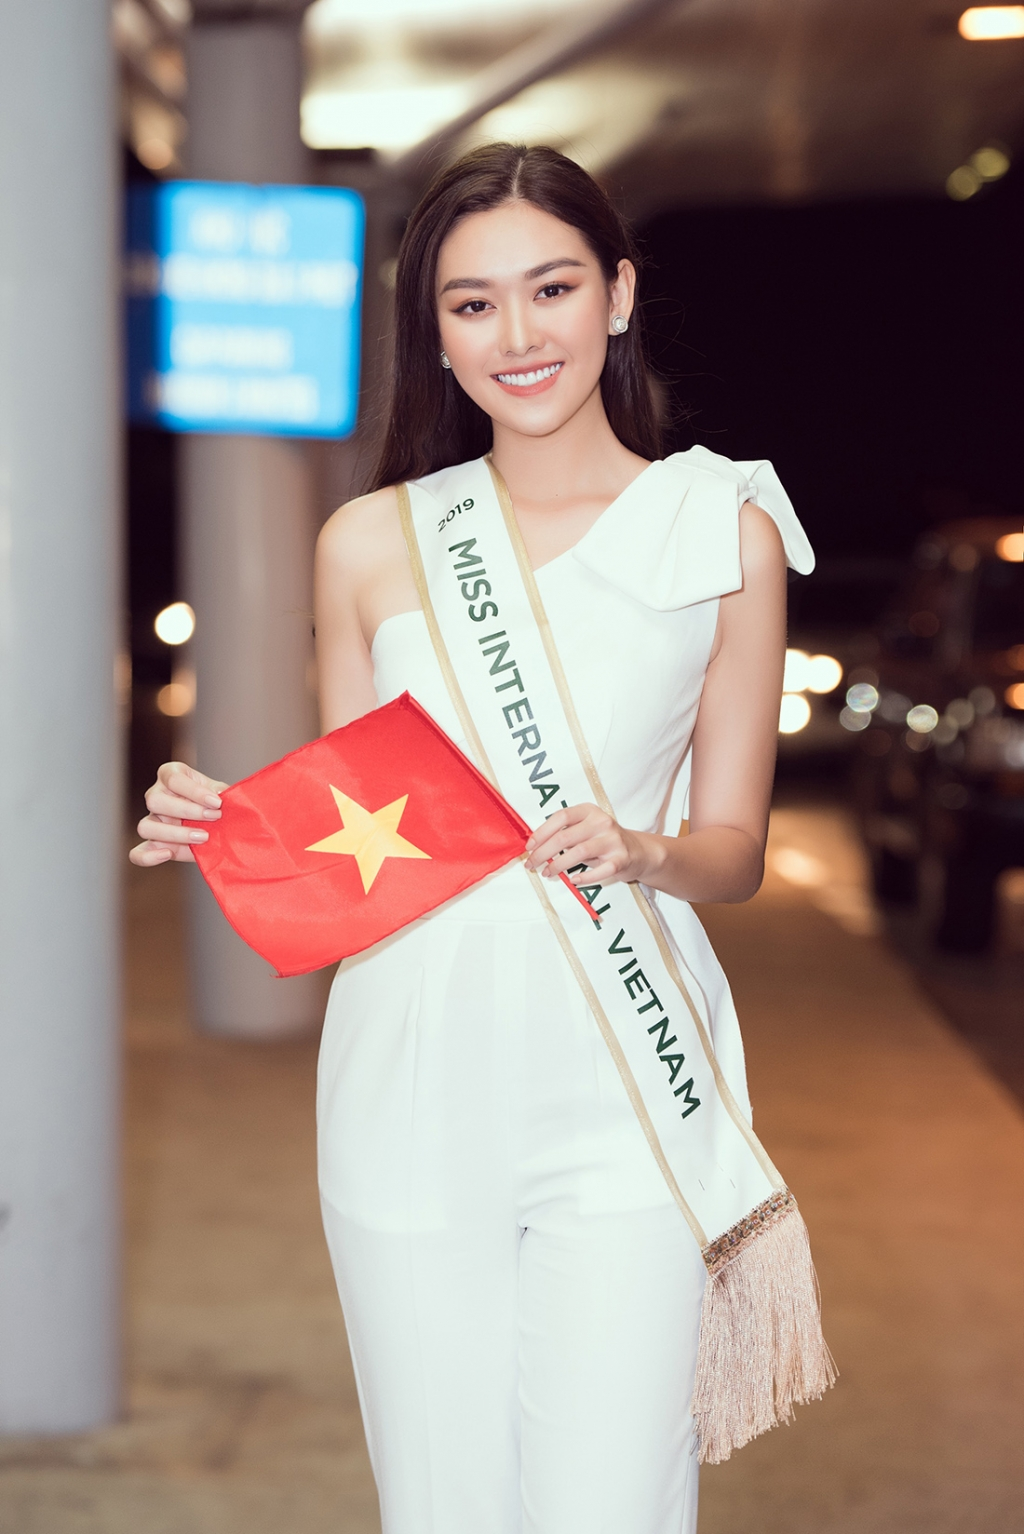 miss international bat ngo cong bo top 10 trang phuc da hoi co ten tuong san